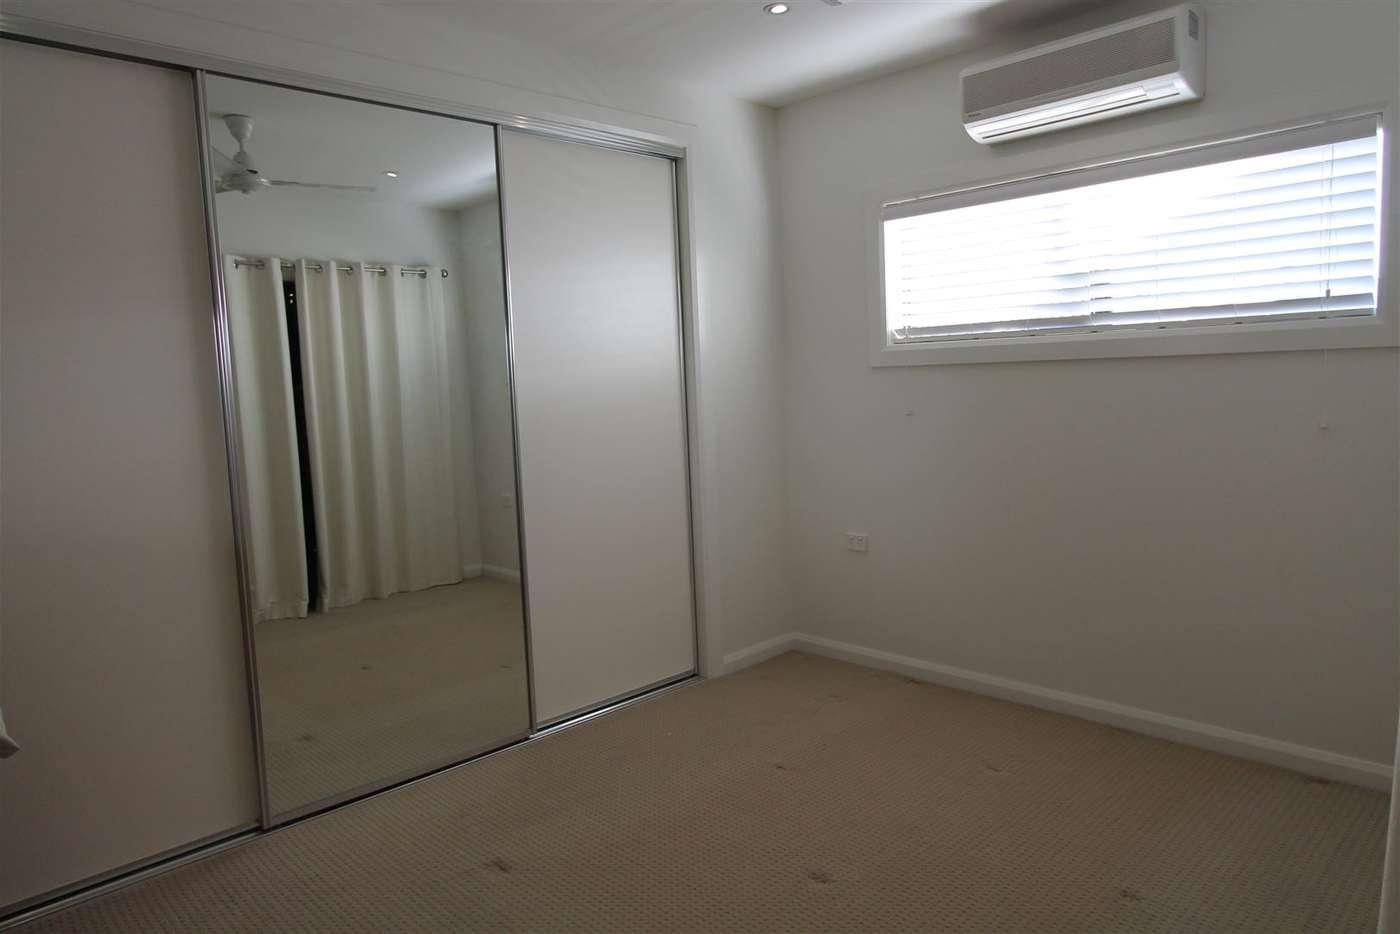 Sixth view of Homely unit listing, 3/49-51 MacMillan Street, Ayr QLD 4807